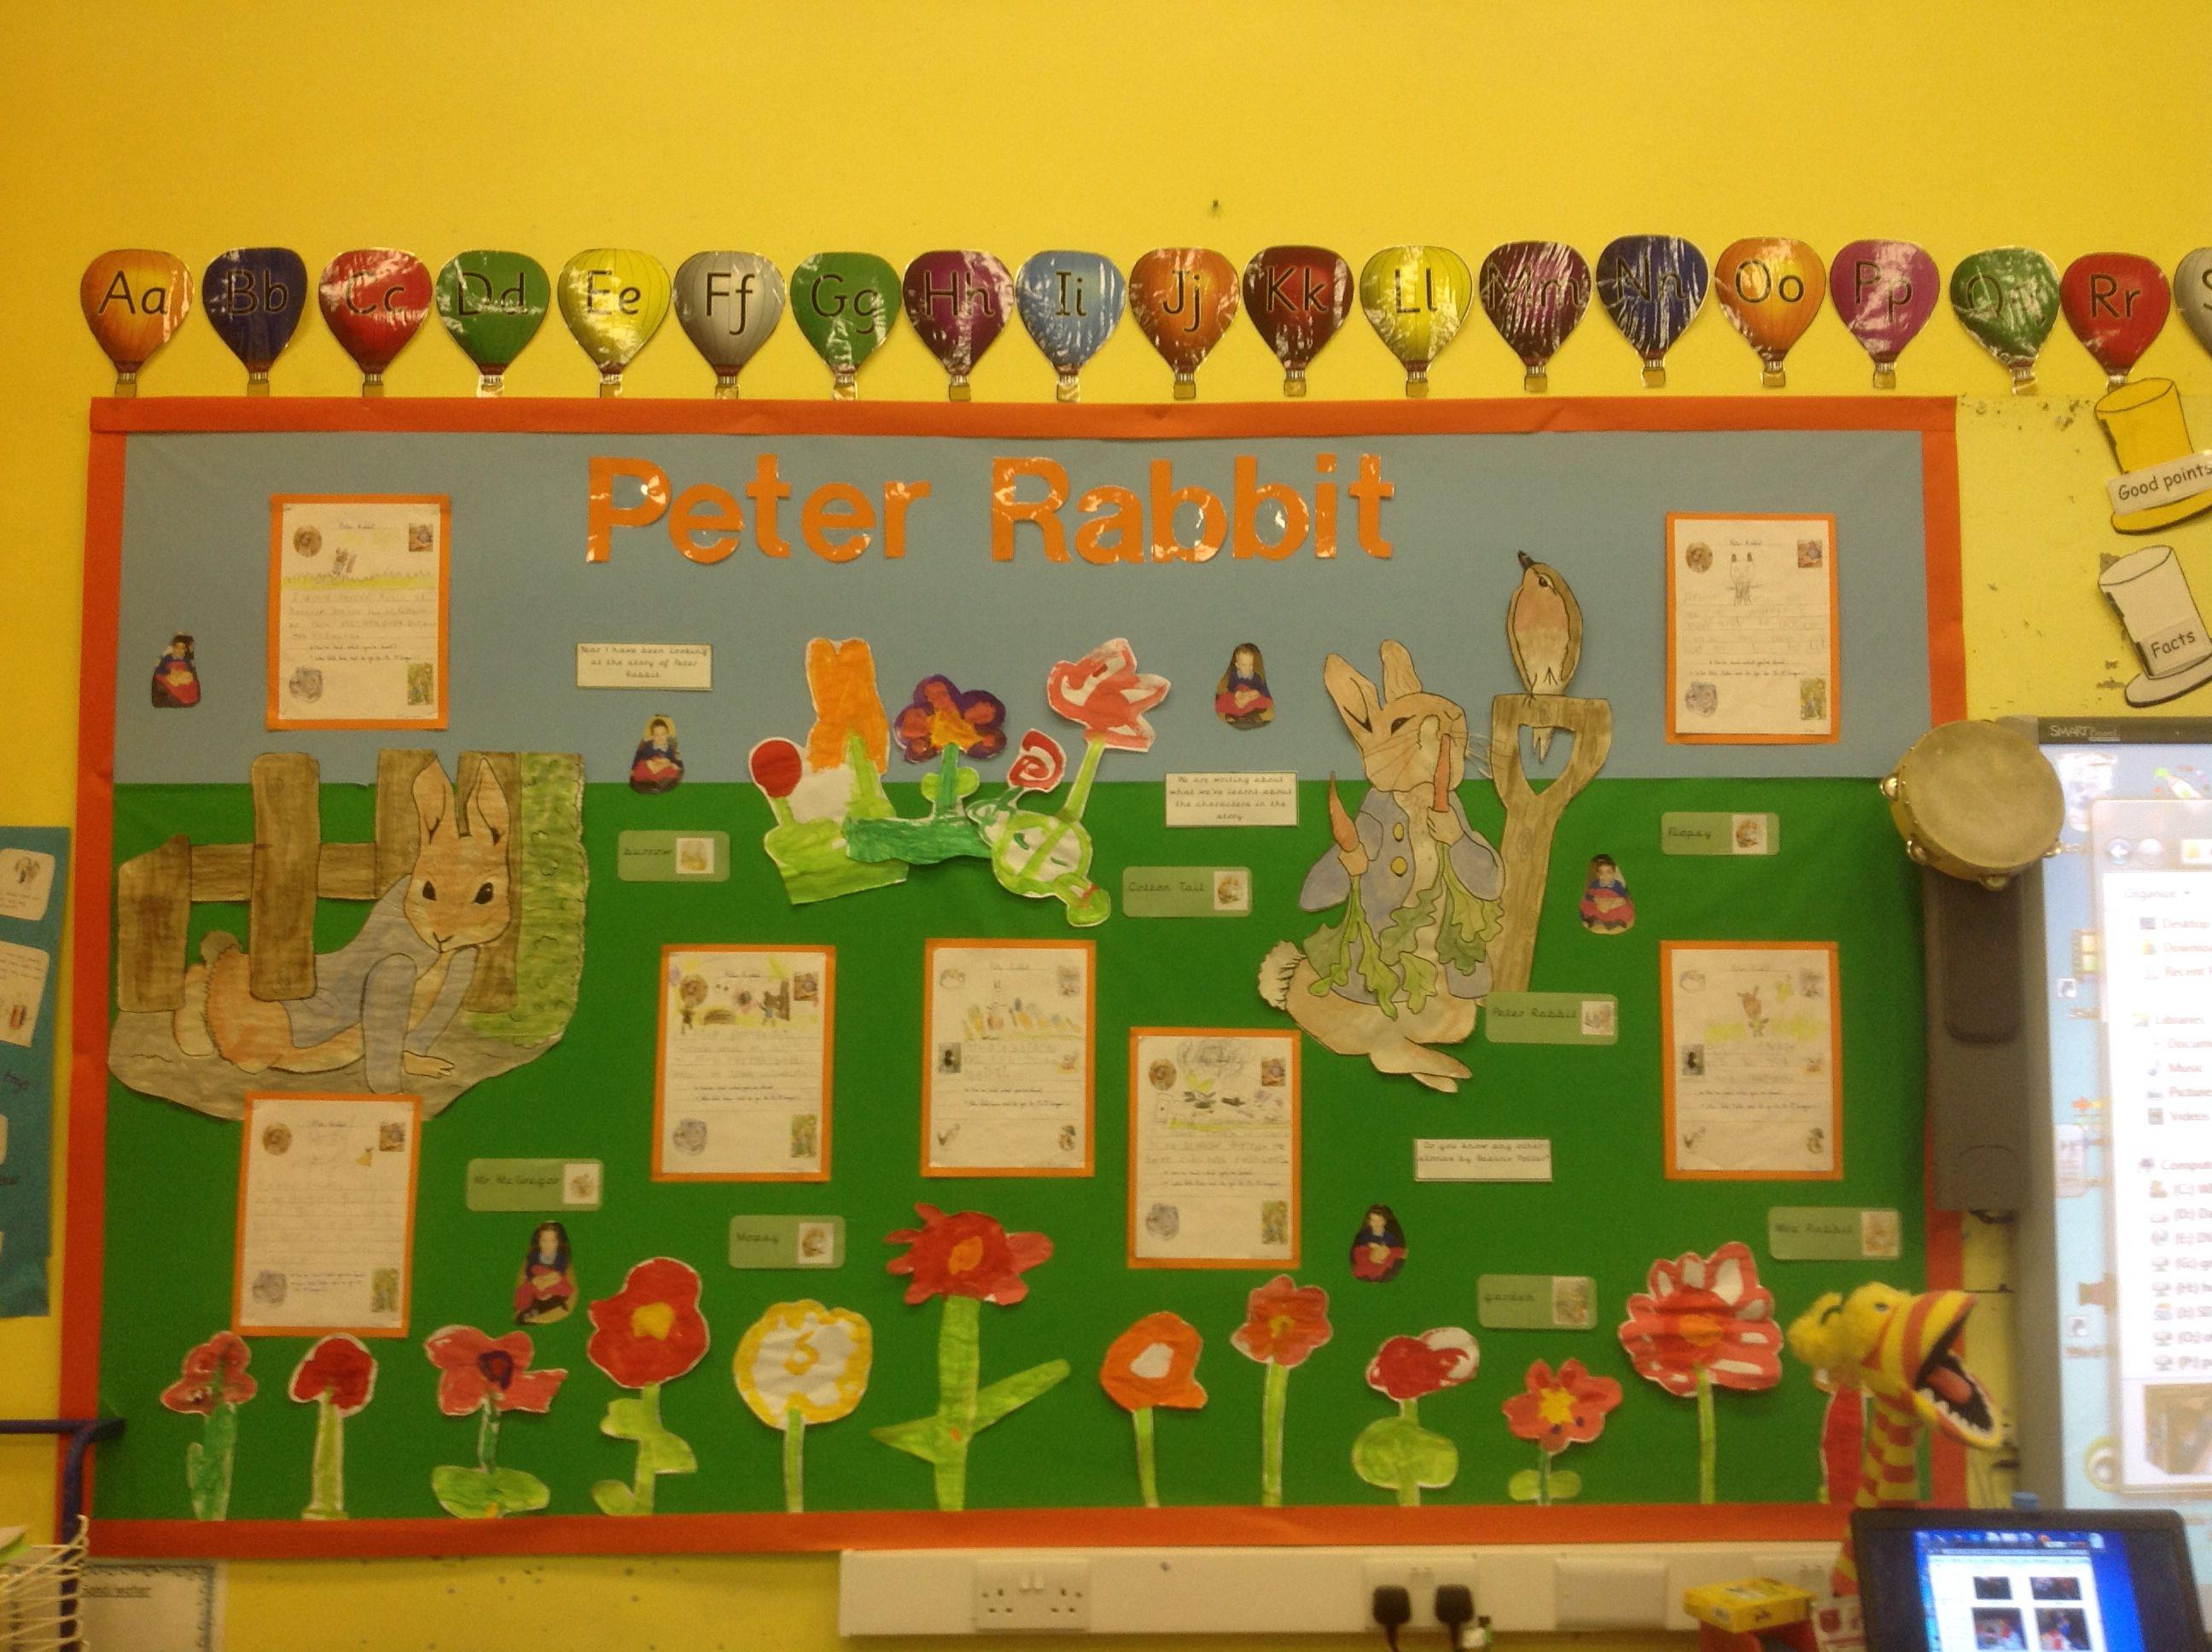 Display based on the Tale of Peter Rabbit   School   Pinterest ...